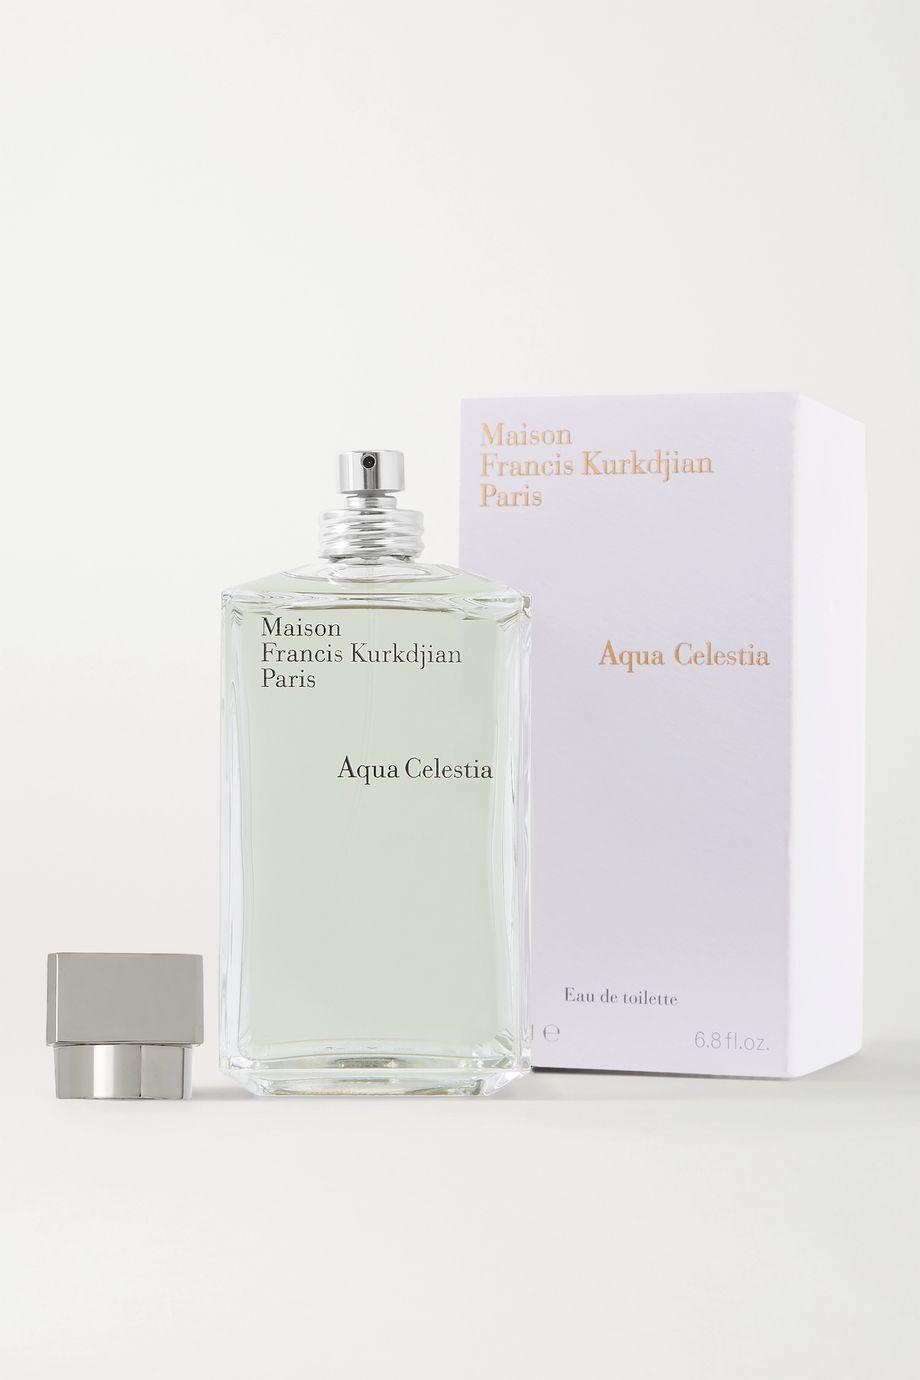 Maison Francis Kurkdjian Aqua Celestia, 200 ml – Eau de Toilette